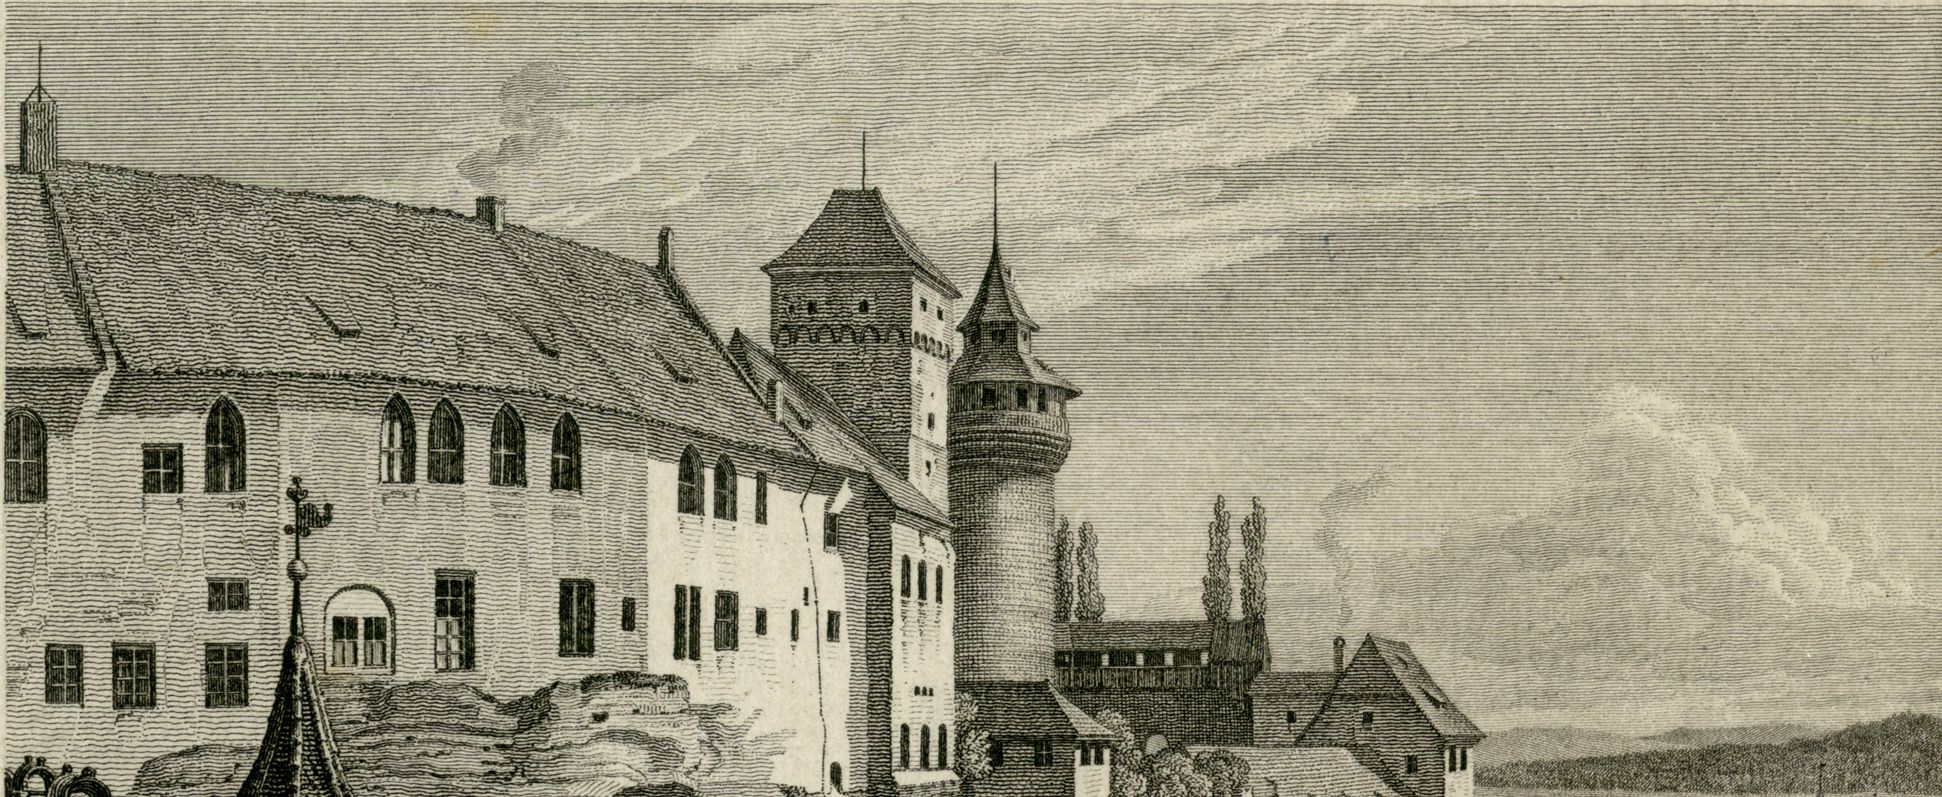 Blick vom Tiergärtnertorturm zur Burg obere Bildhälfte